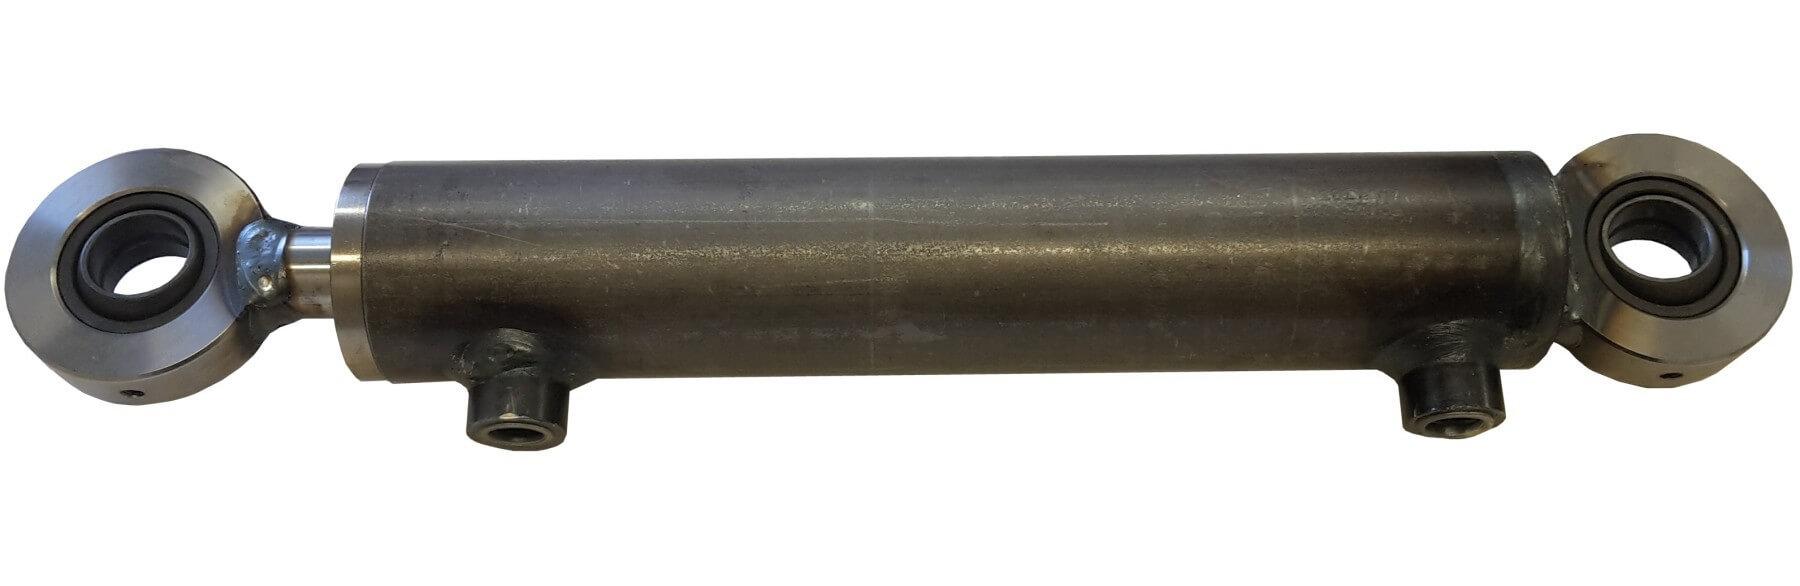 Hydraulisylinteri CL 70. 40. 500 GE